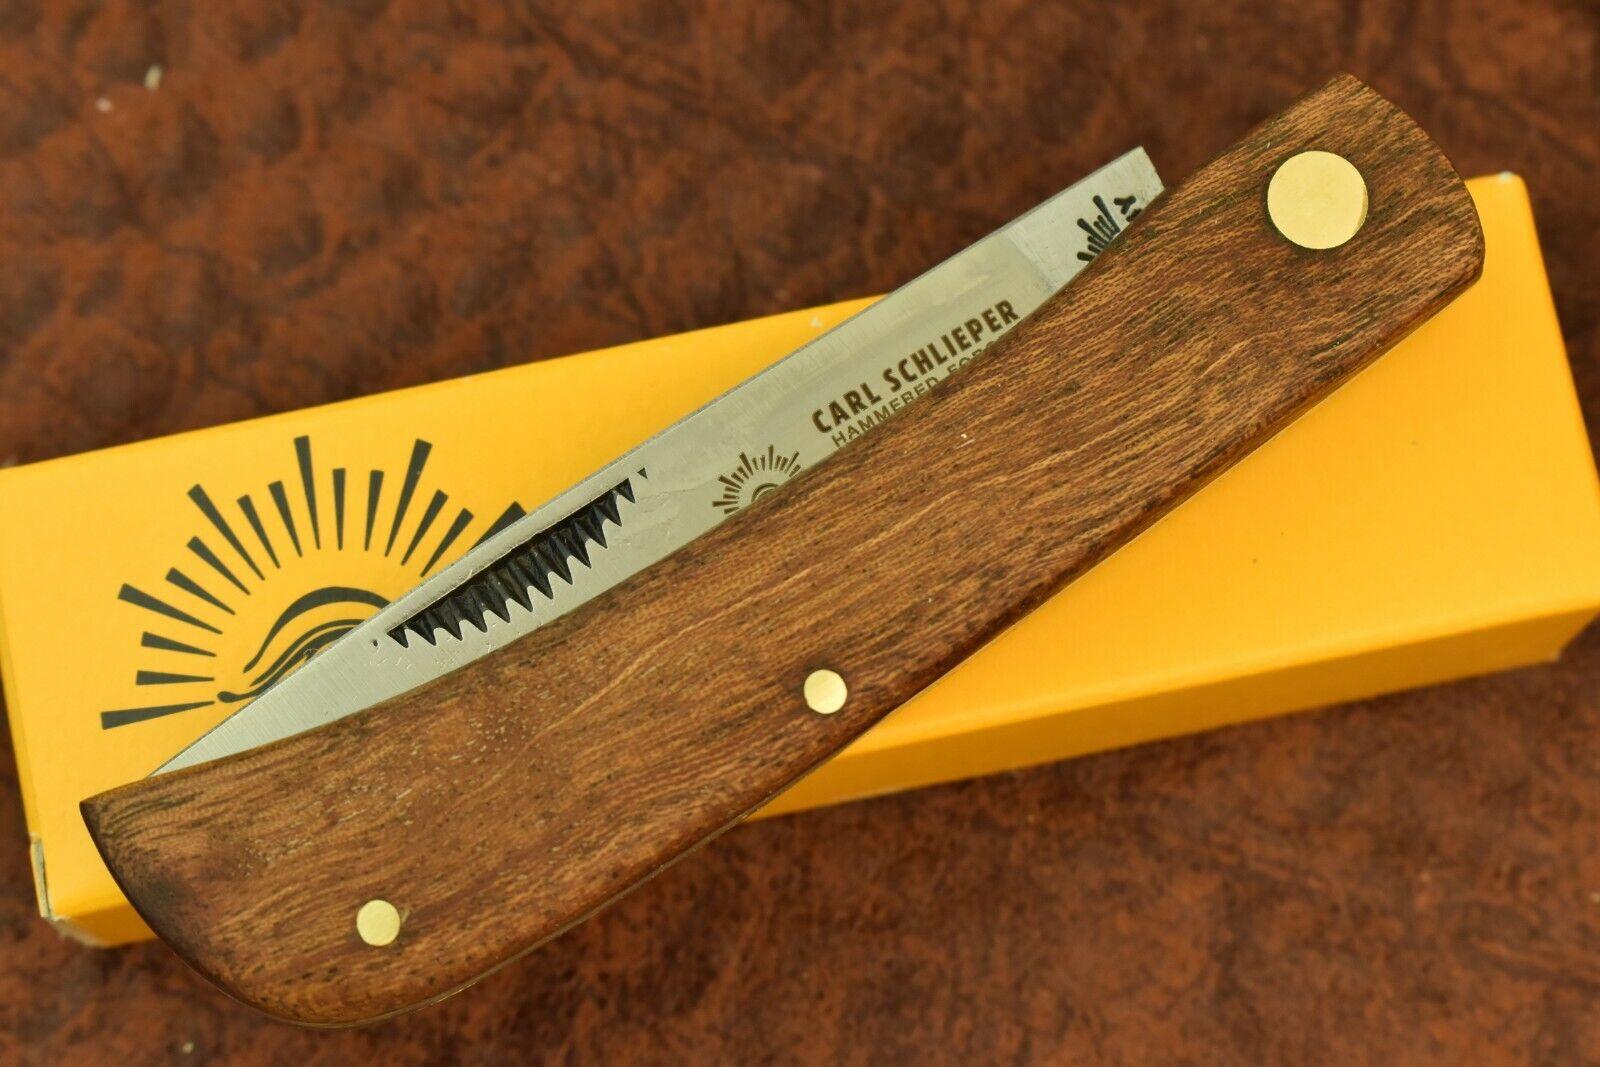 GERMAN EYE BRAND CARL SCHLIEPER WOOD SODBUSTER KNIFE 99JR SOLINGEN GERMANY (9547